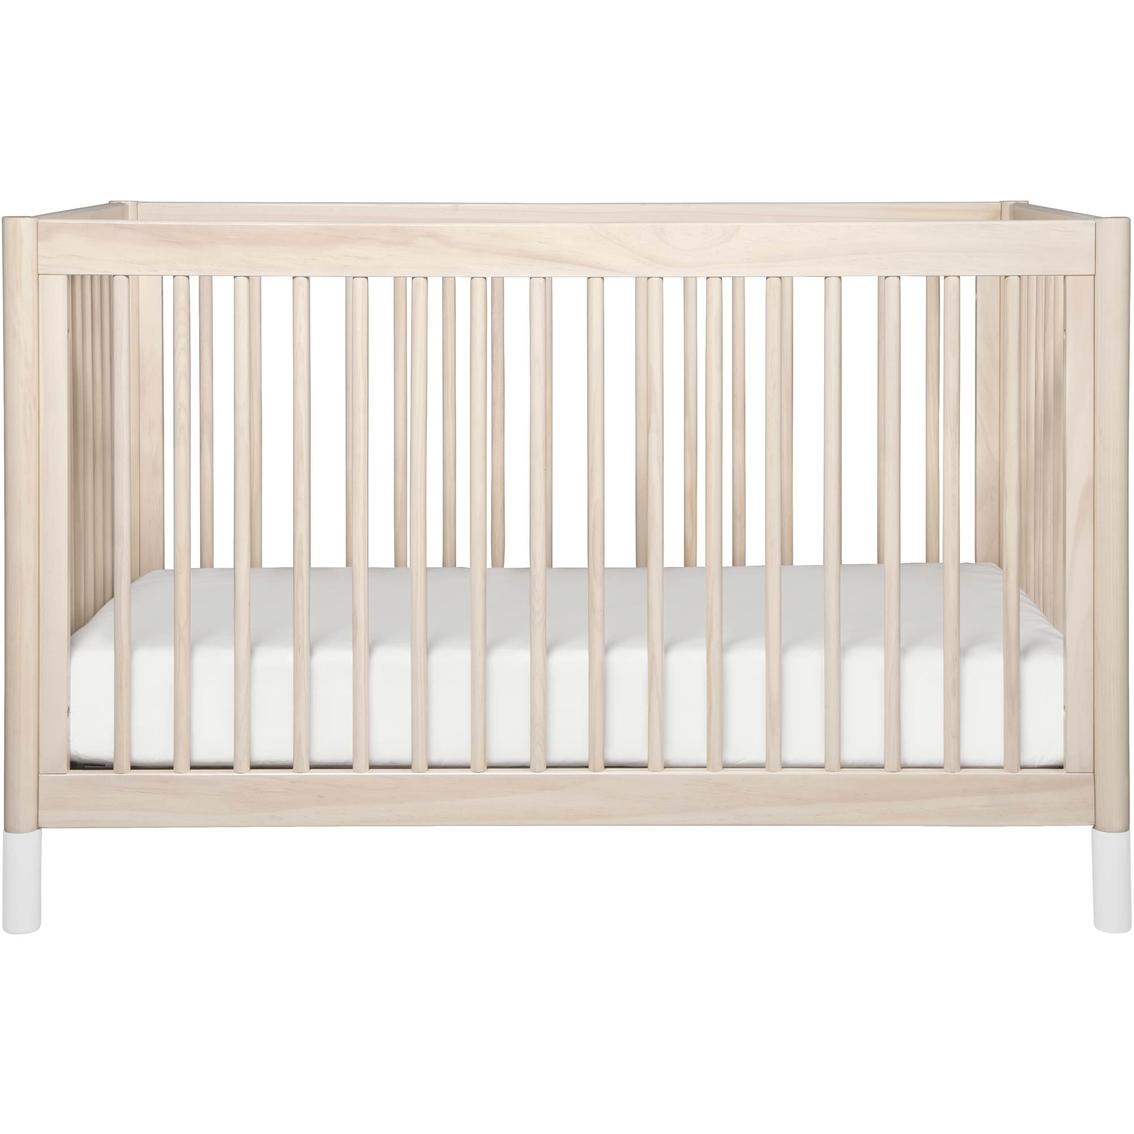 Million Dollar Baby Babyletto Gelato 4 In 1 Convertible Crib Cribs Baby Toys Shop The Exchange